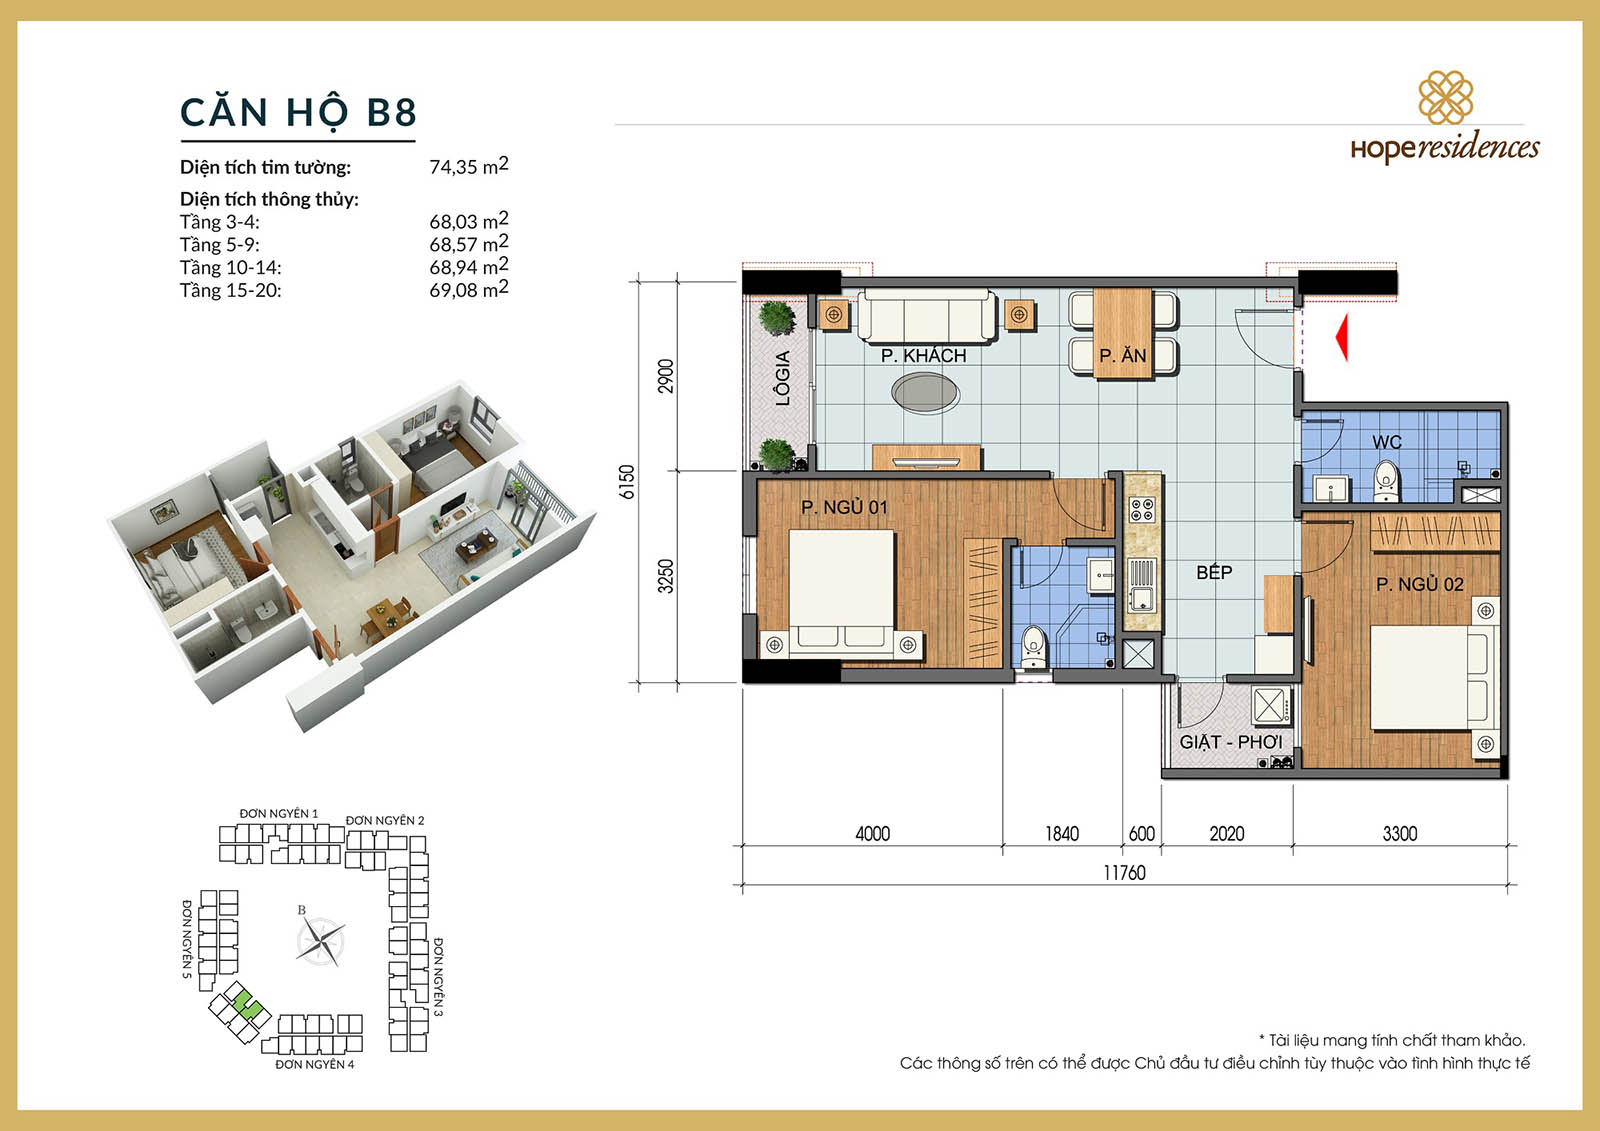 mat-bang-thiet-ke-can-ho-b7-hope-residences